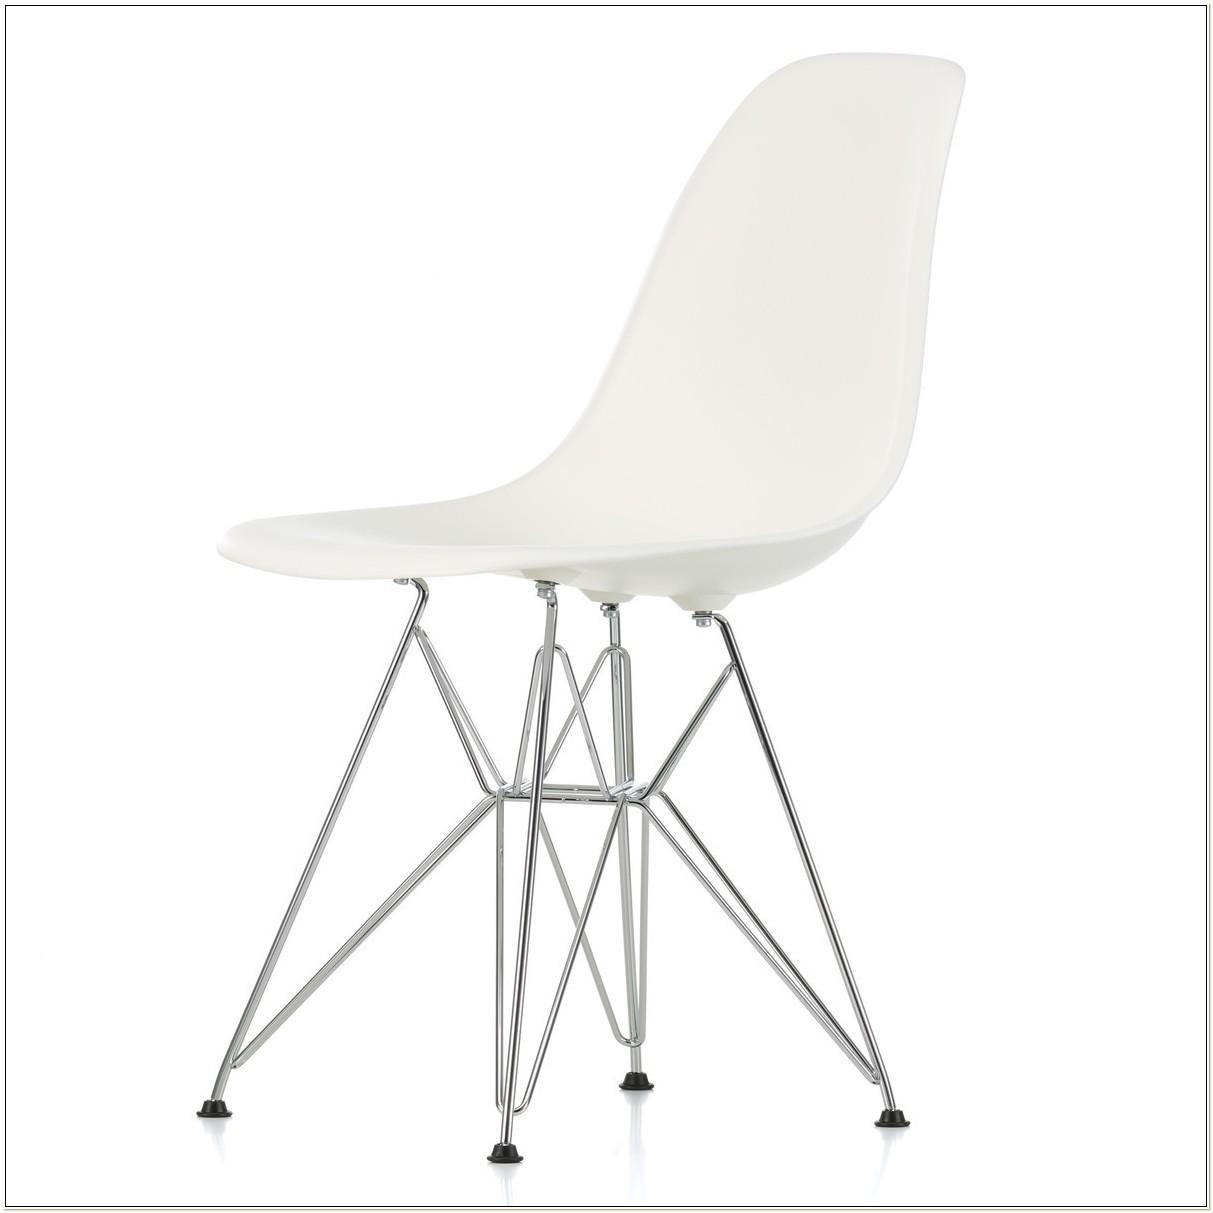 Eames Plastic Side Chair Dsr Preis